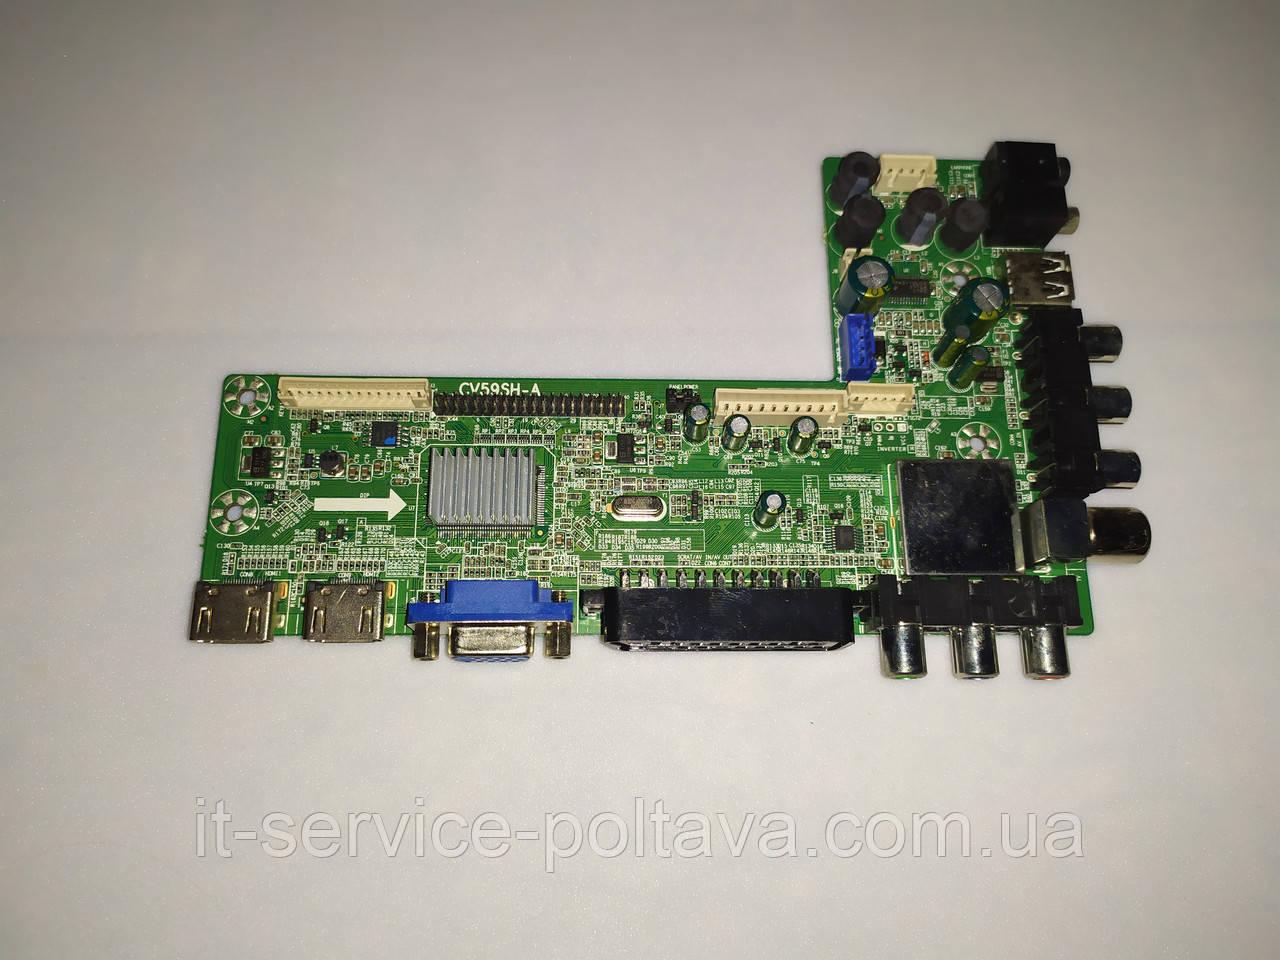 Материнська плата (Main Board) CV59SH-A для телевізора Orion